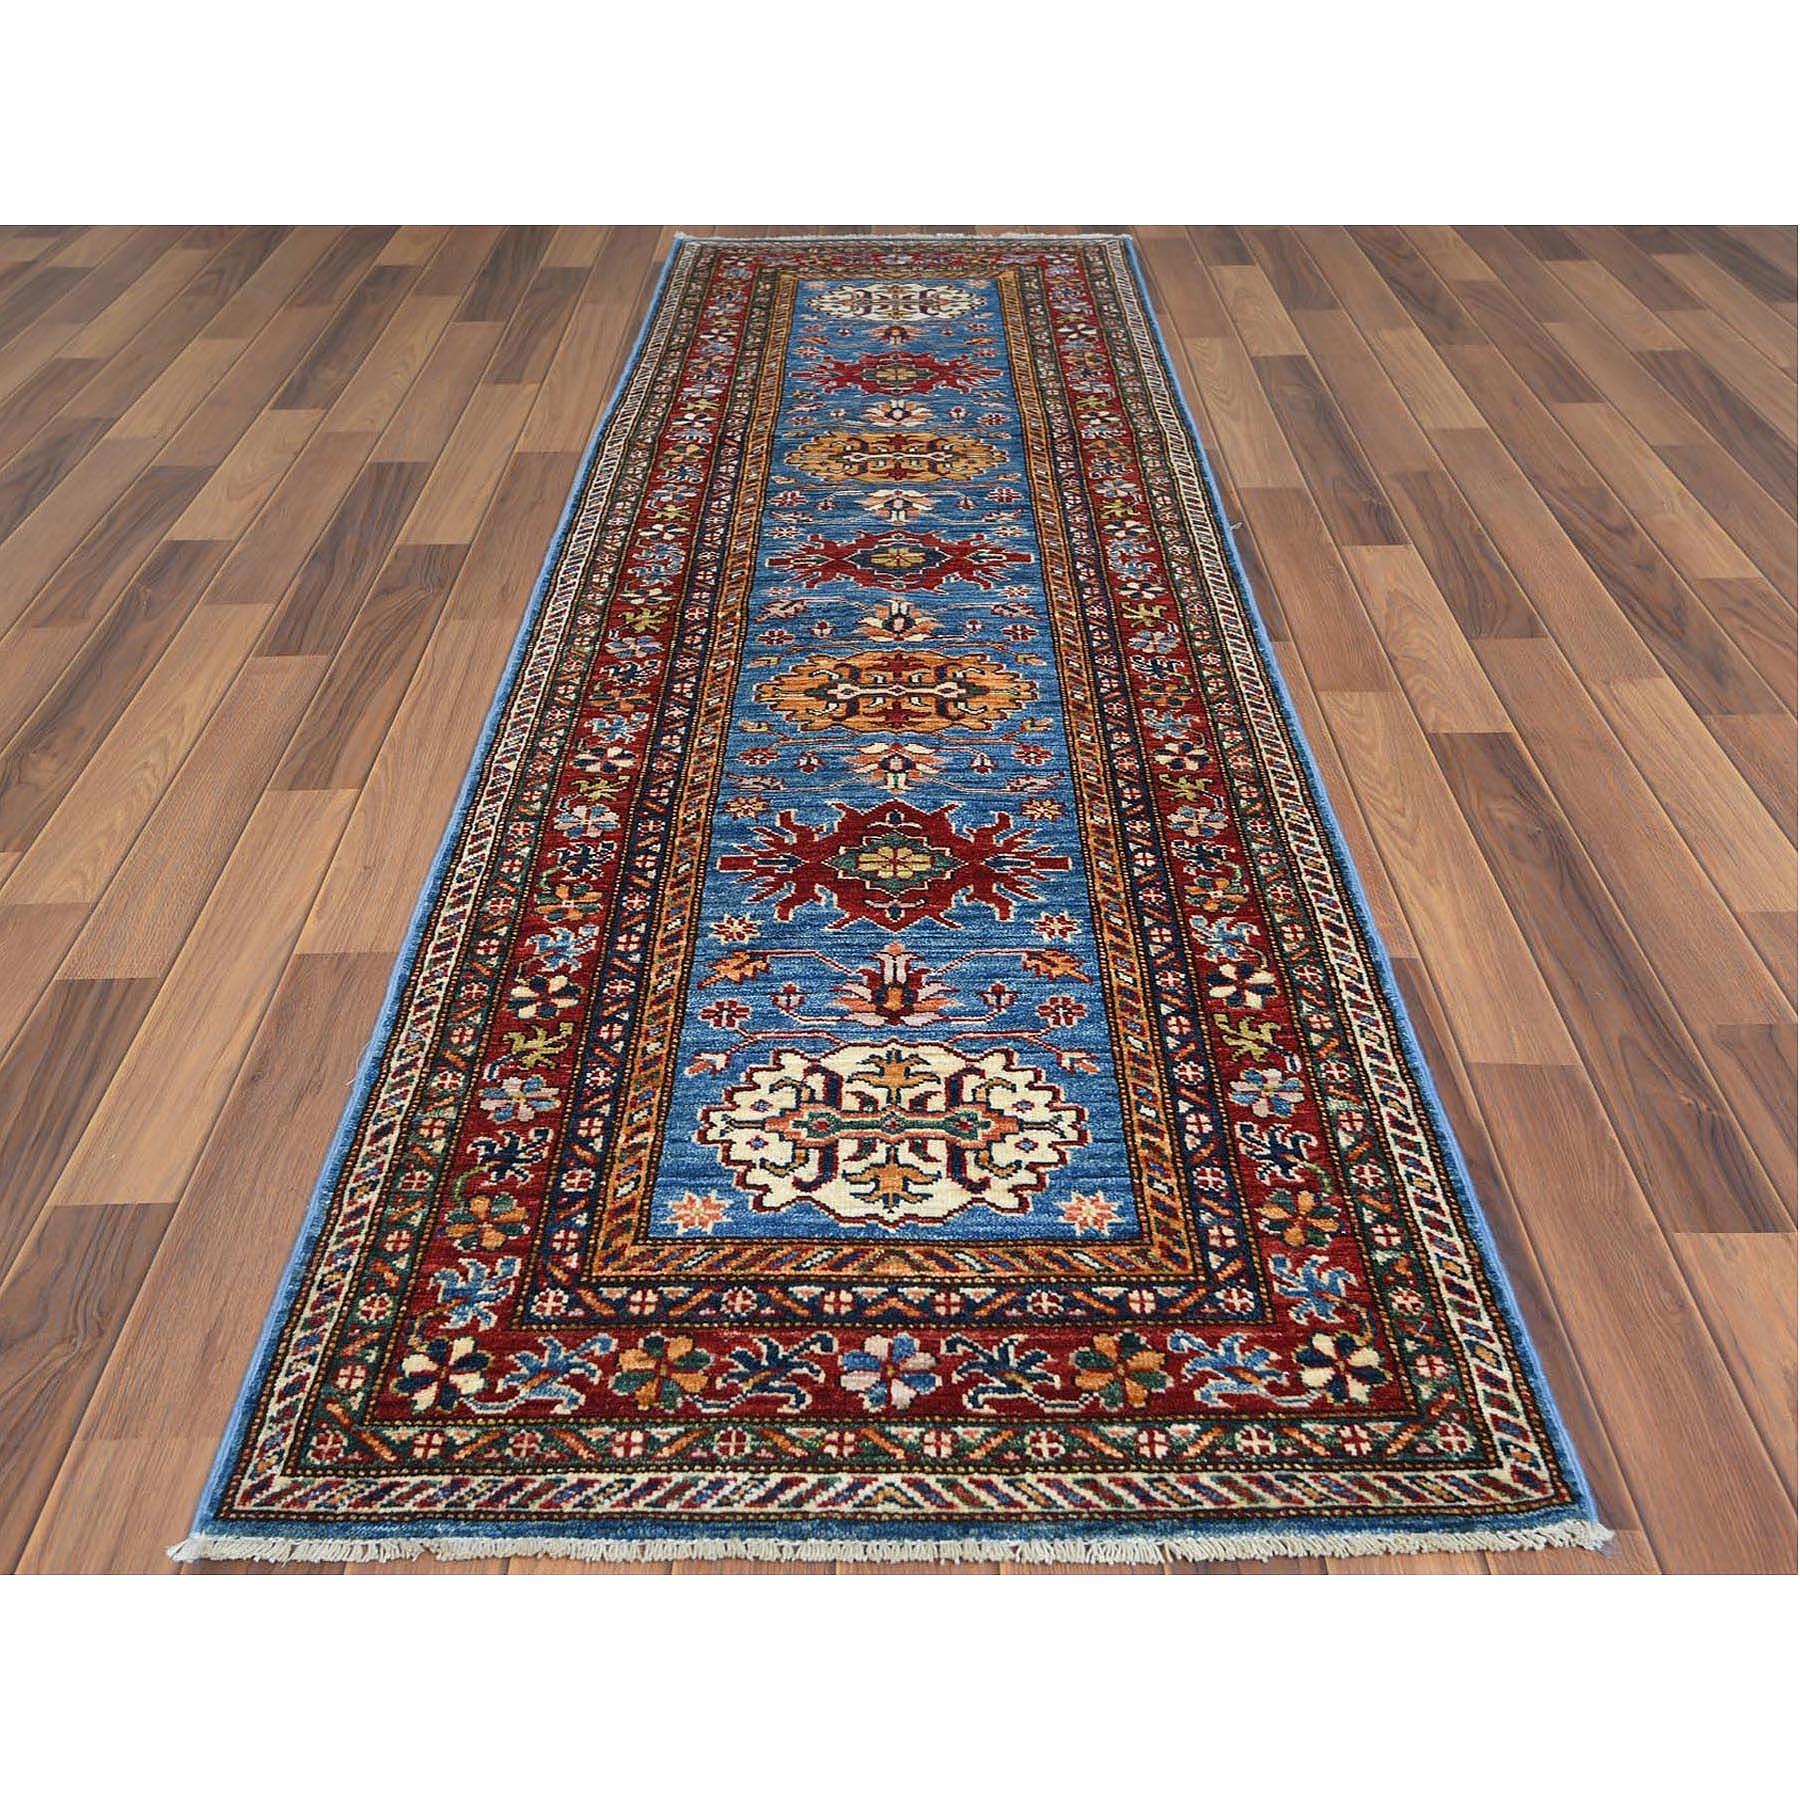 "2'7""x8'6"" Hand Knotted Denim Blue Geometric Design Super Kazak luxurious Wool Oriental Runner Rug"